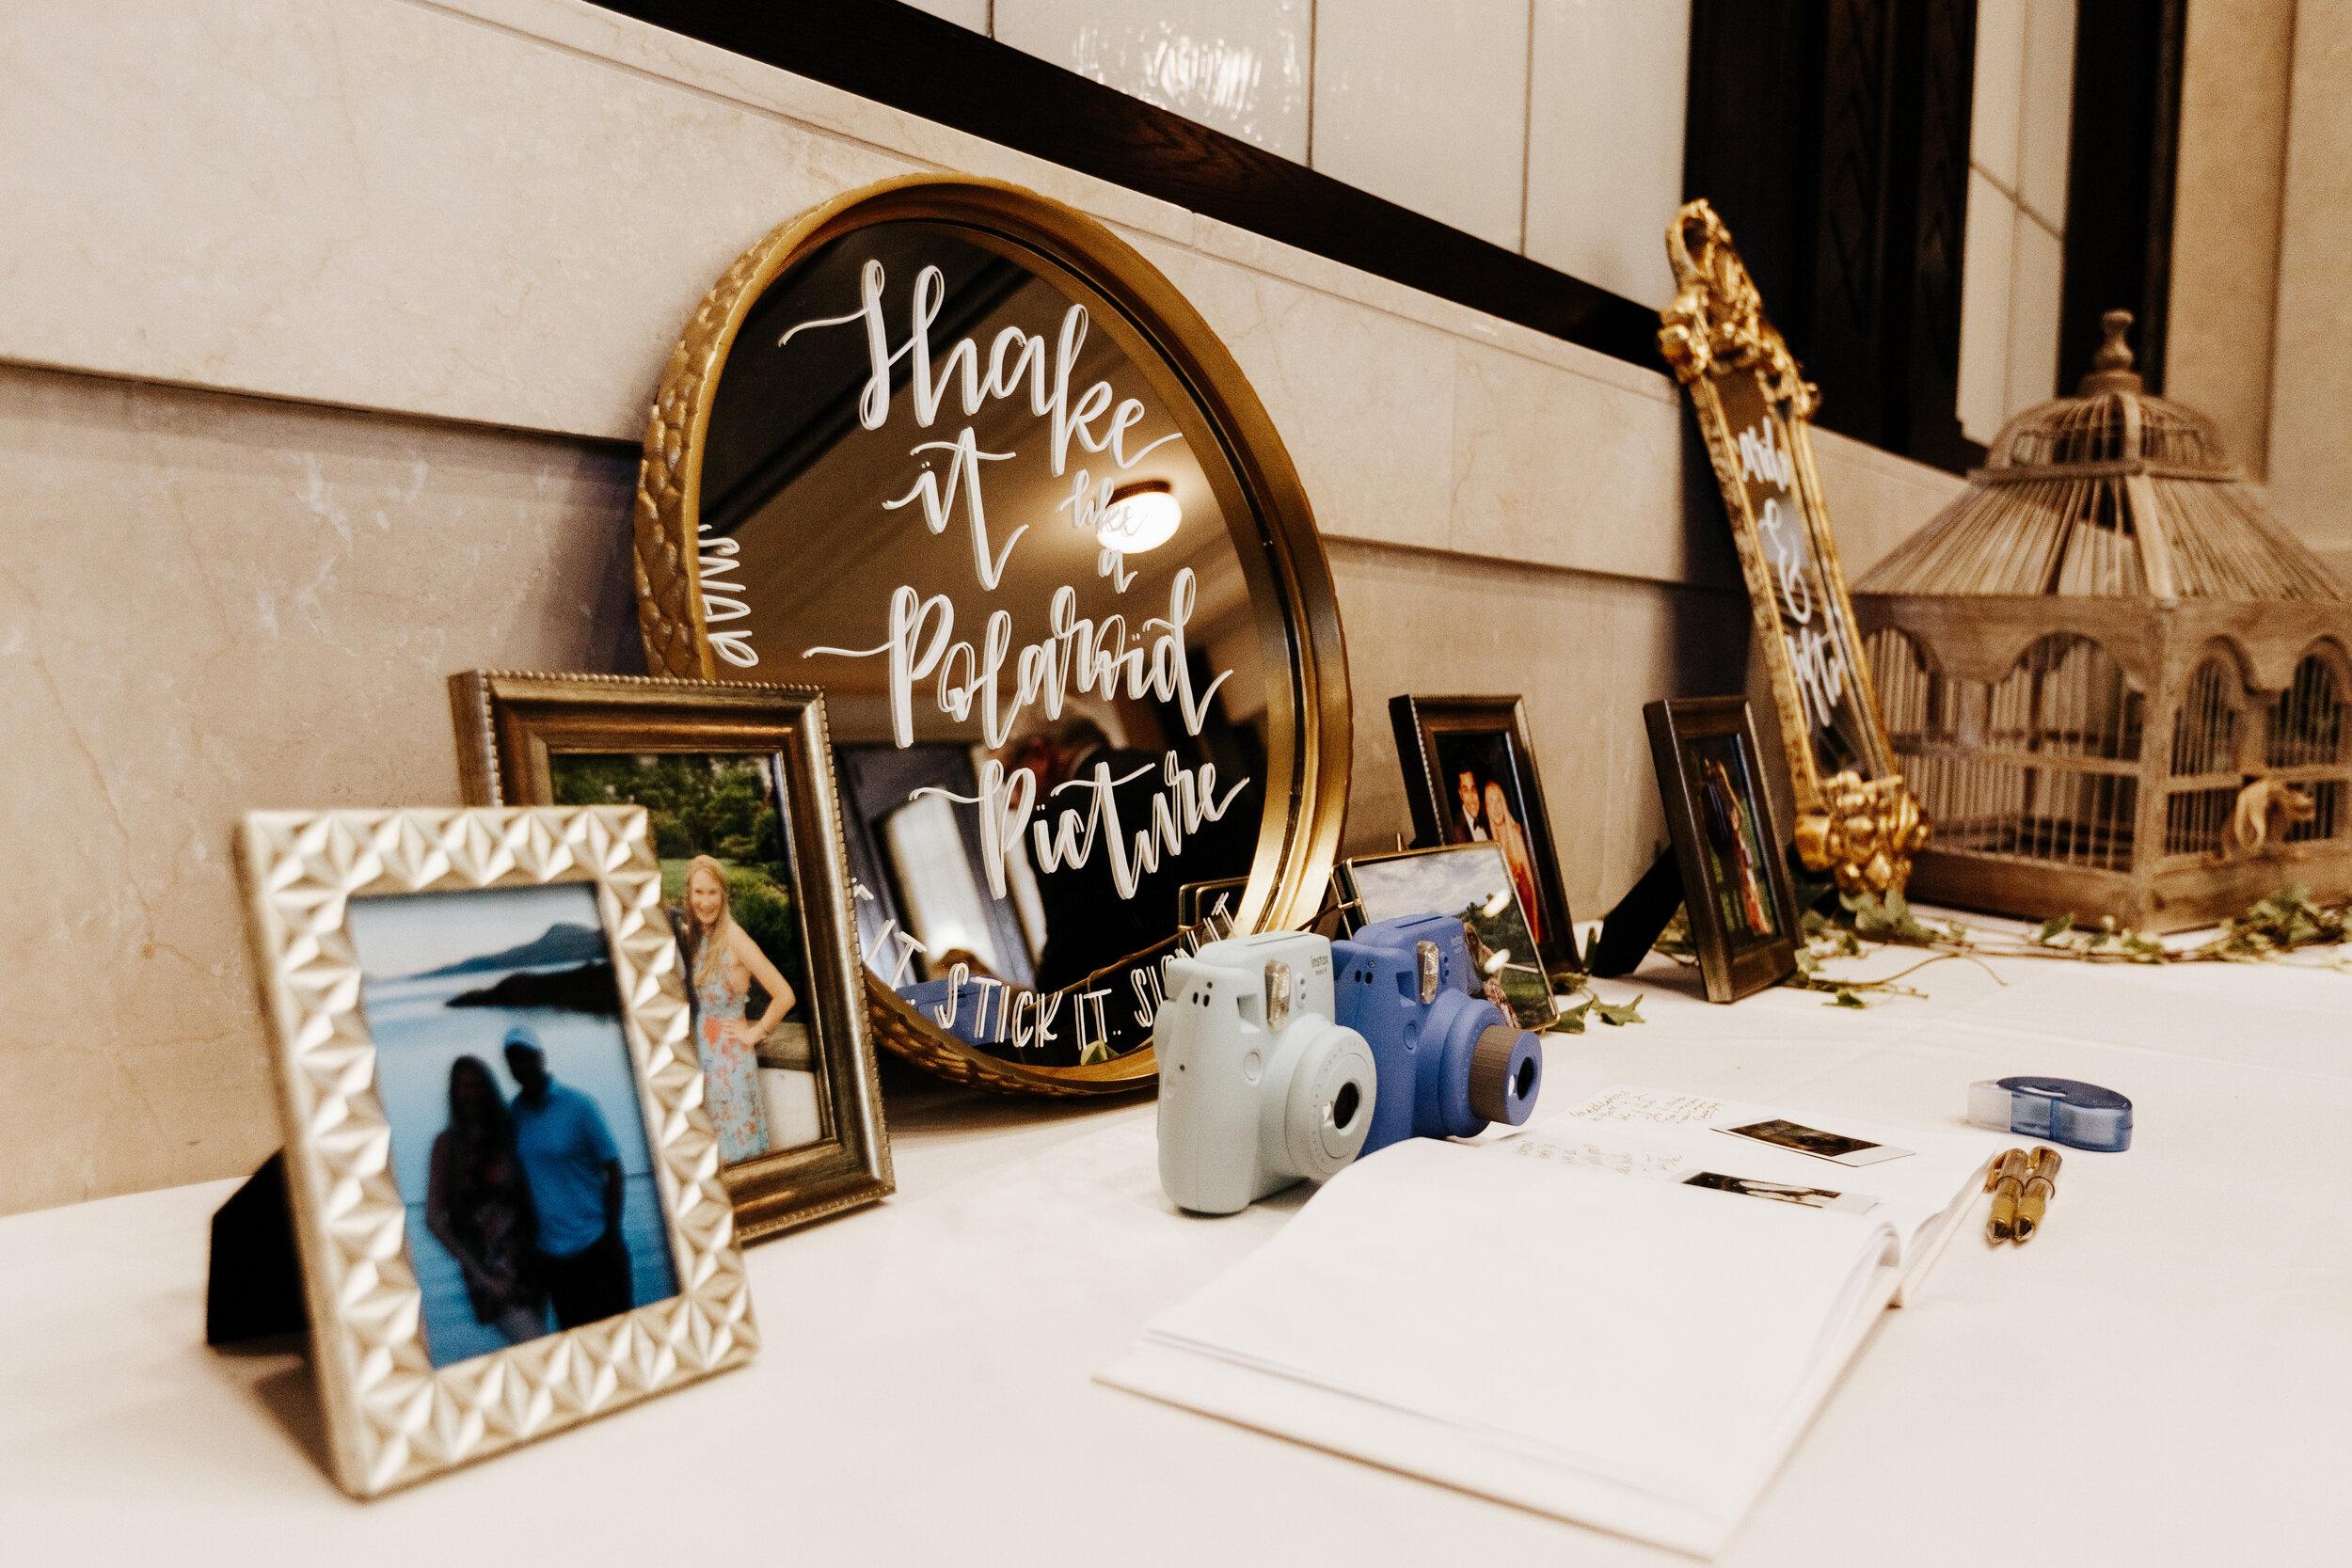 Cassie-Mrunal-Wedding-Quirk-Hotel-John-Marshall-Ballrooms-Richmond-Virginia-Photography-by-V-53.jpg